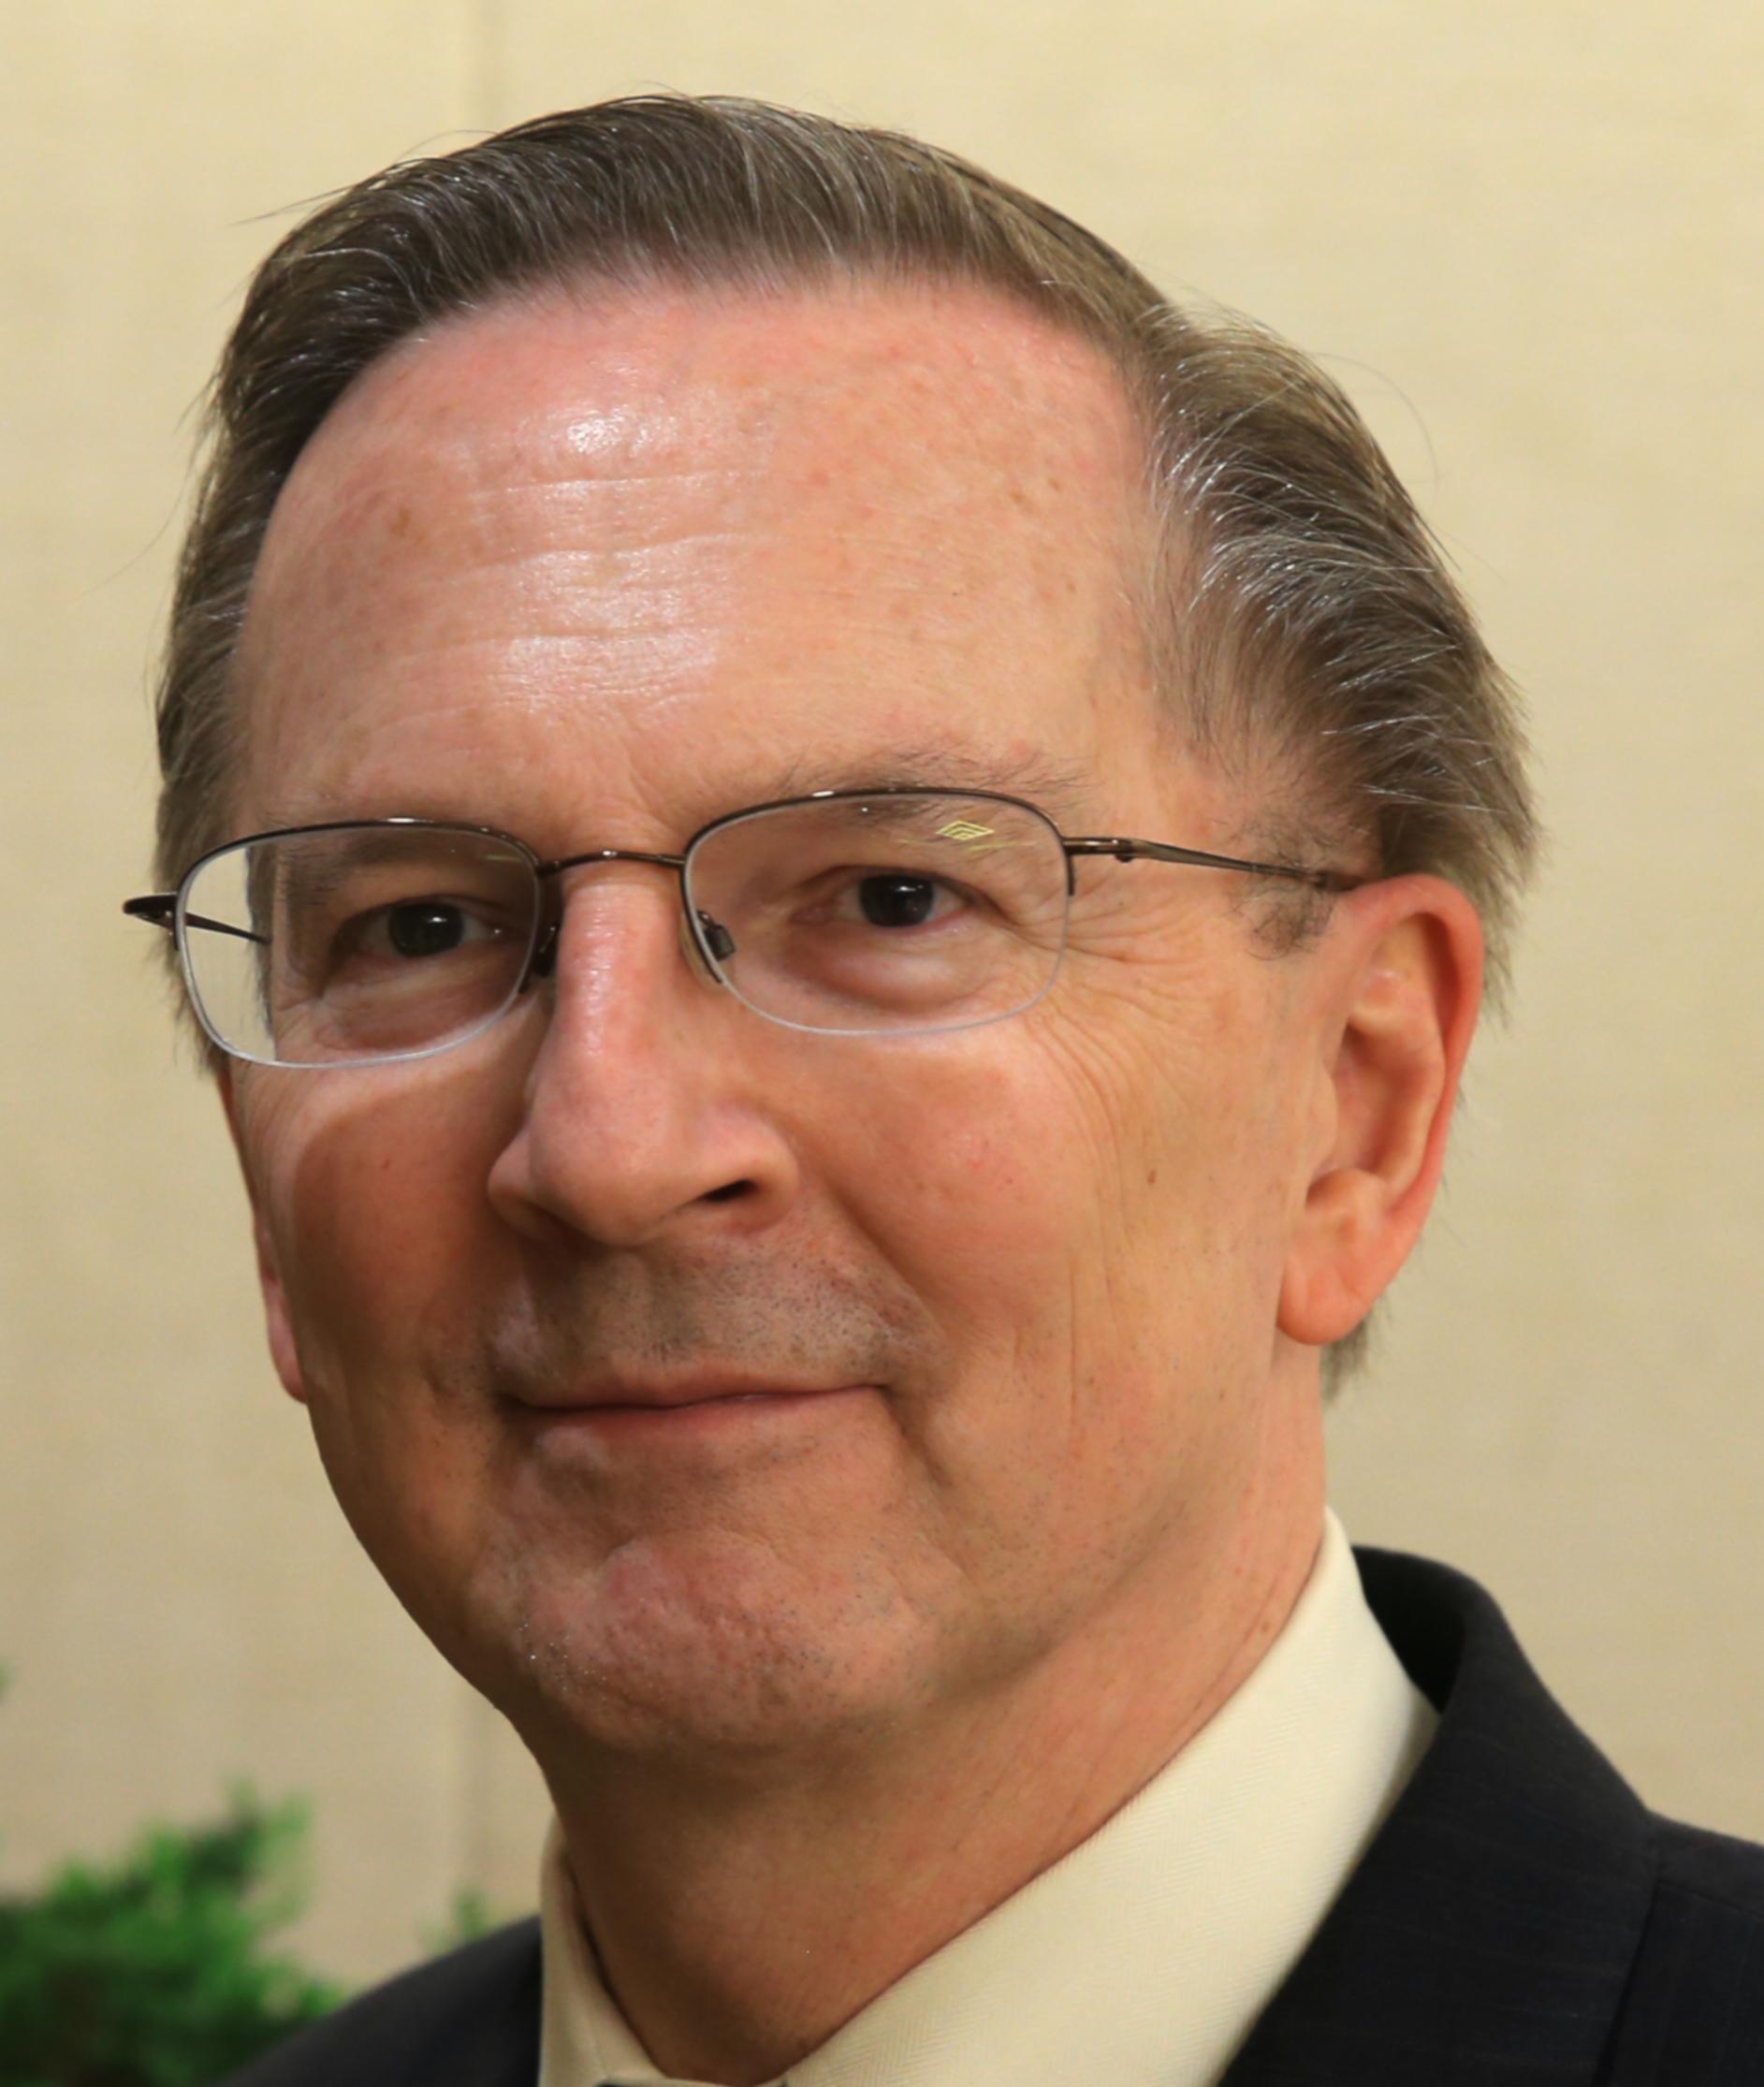 Professor Jack Szostak